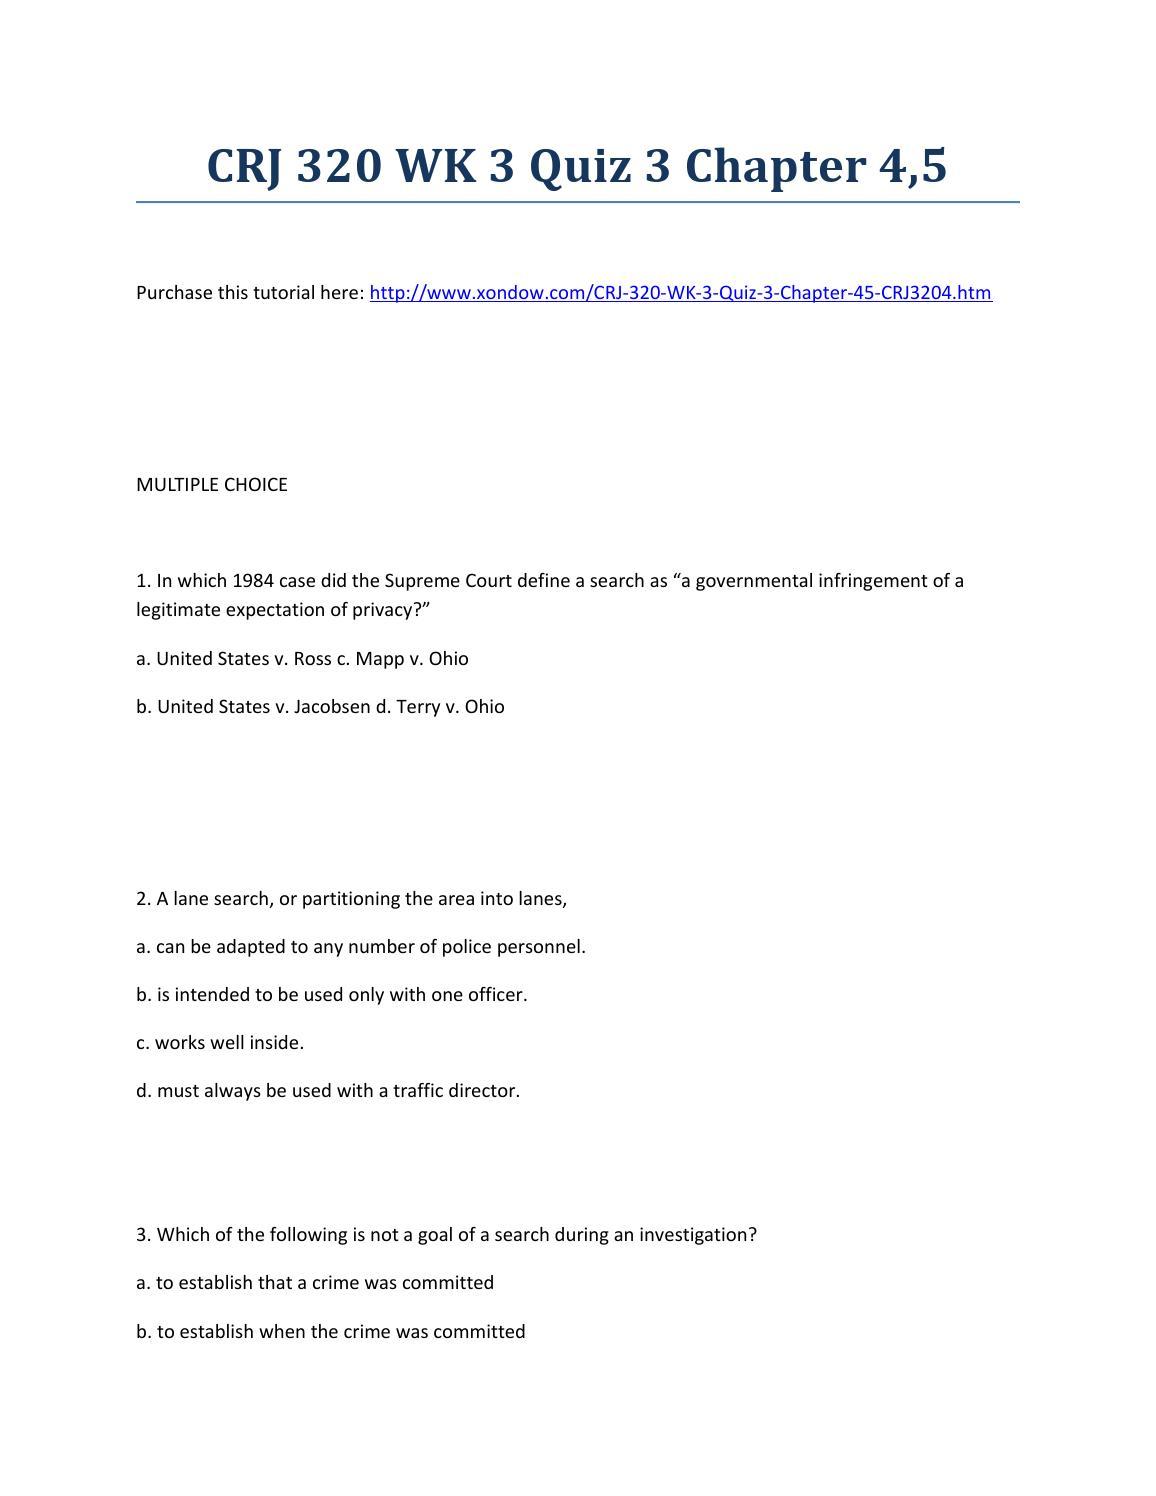 Crj 320 week 3 quiz 3 chapter 4,5 strayer university new by